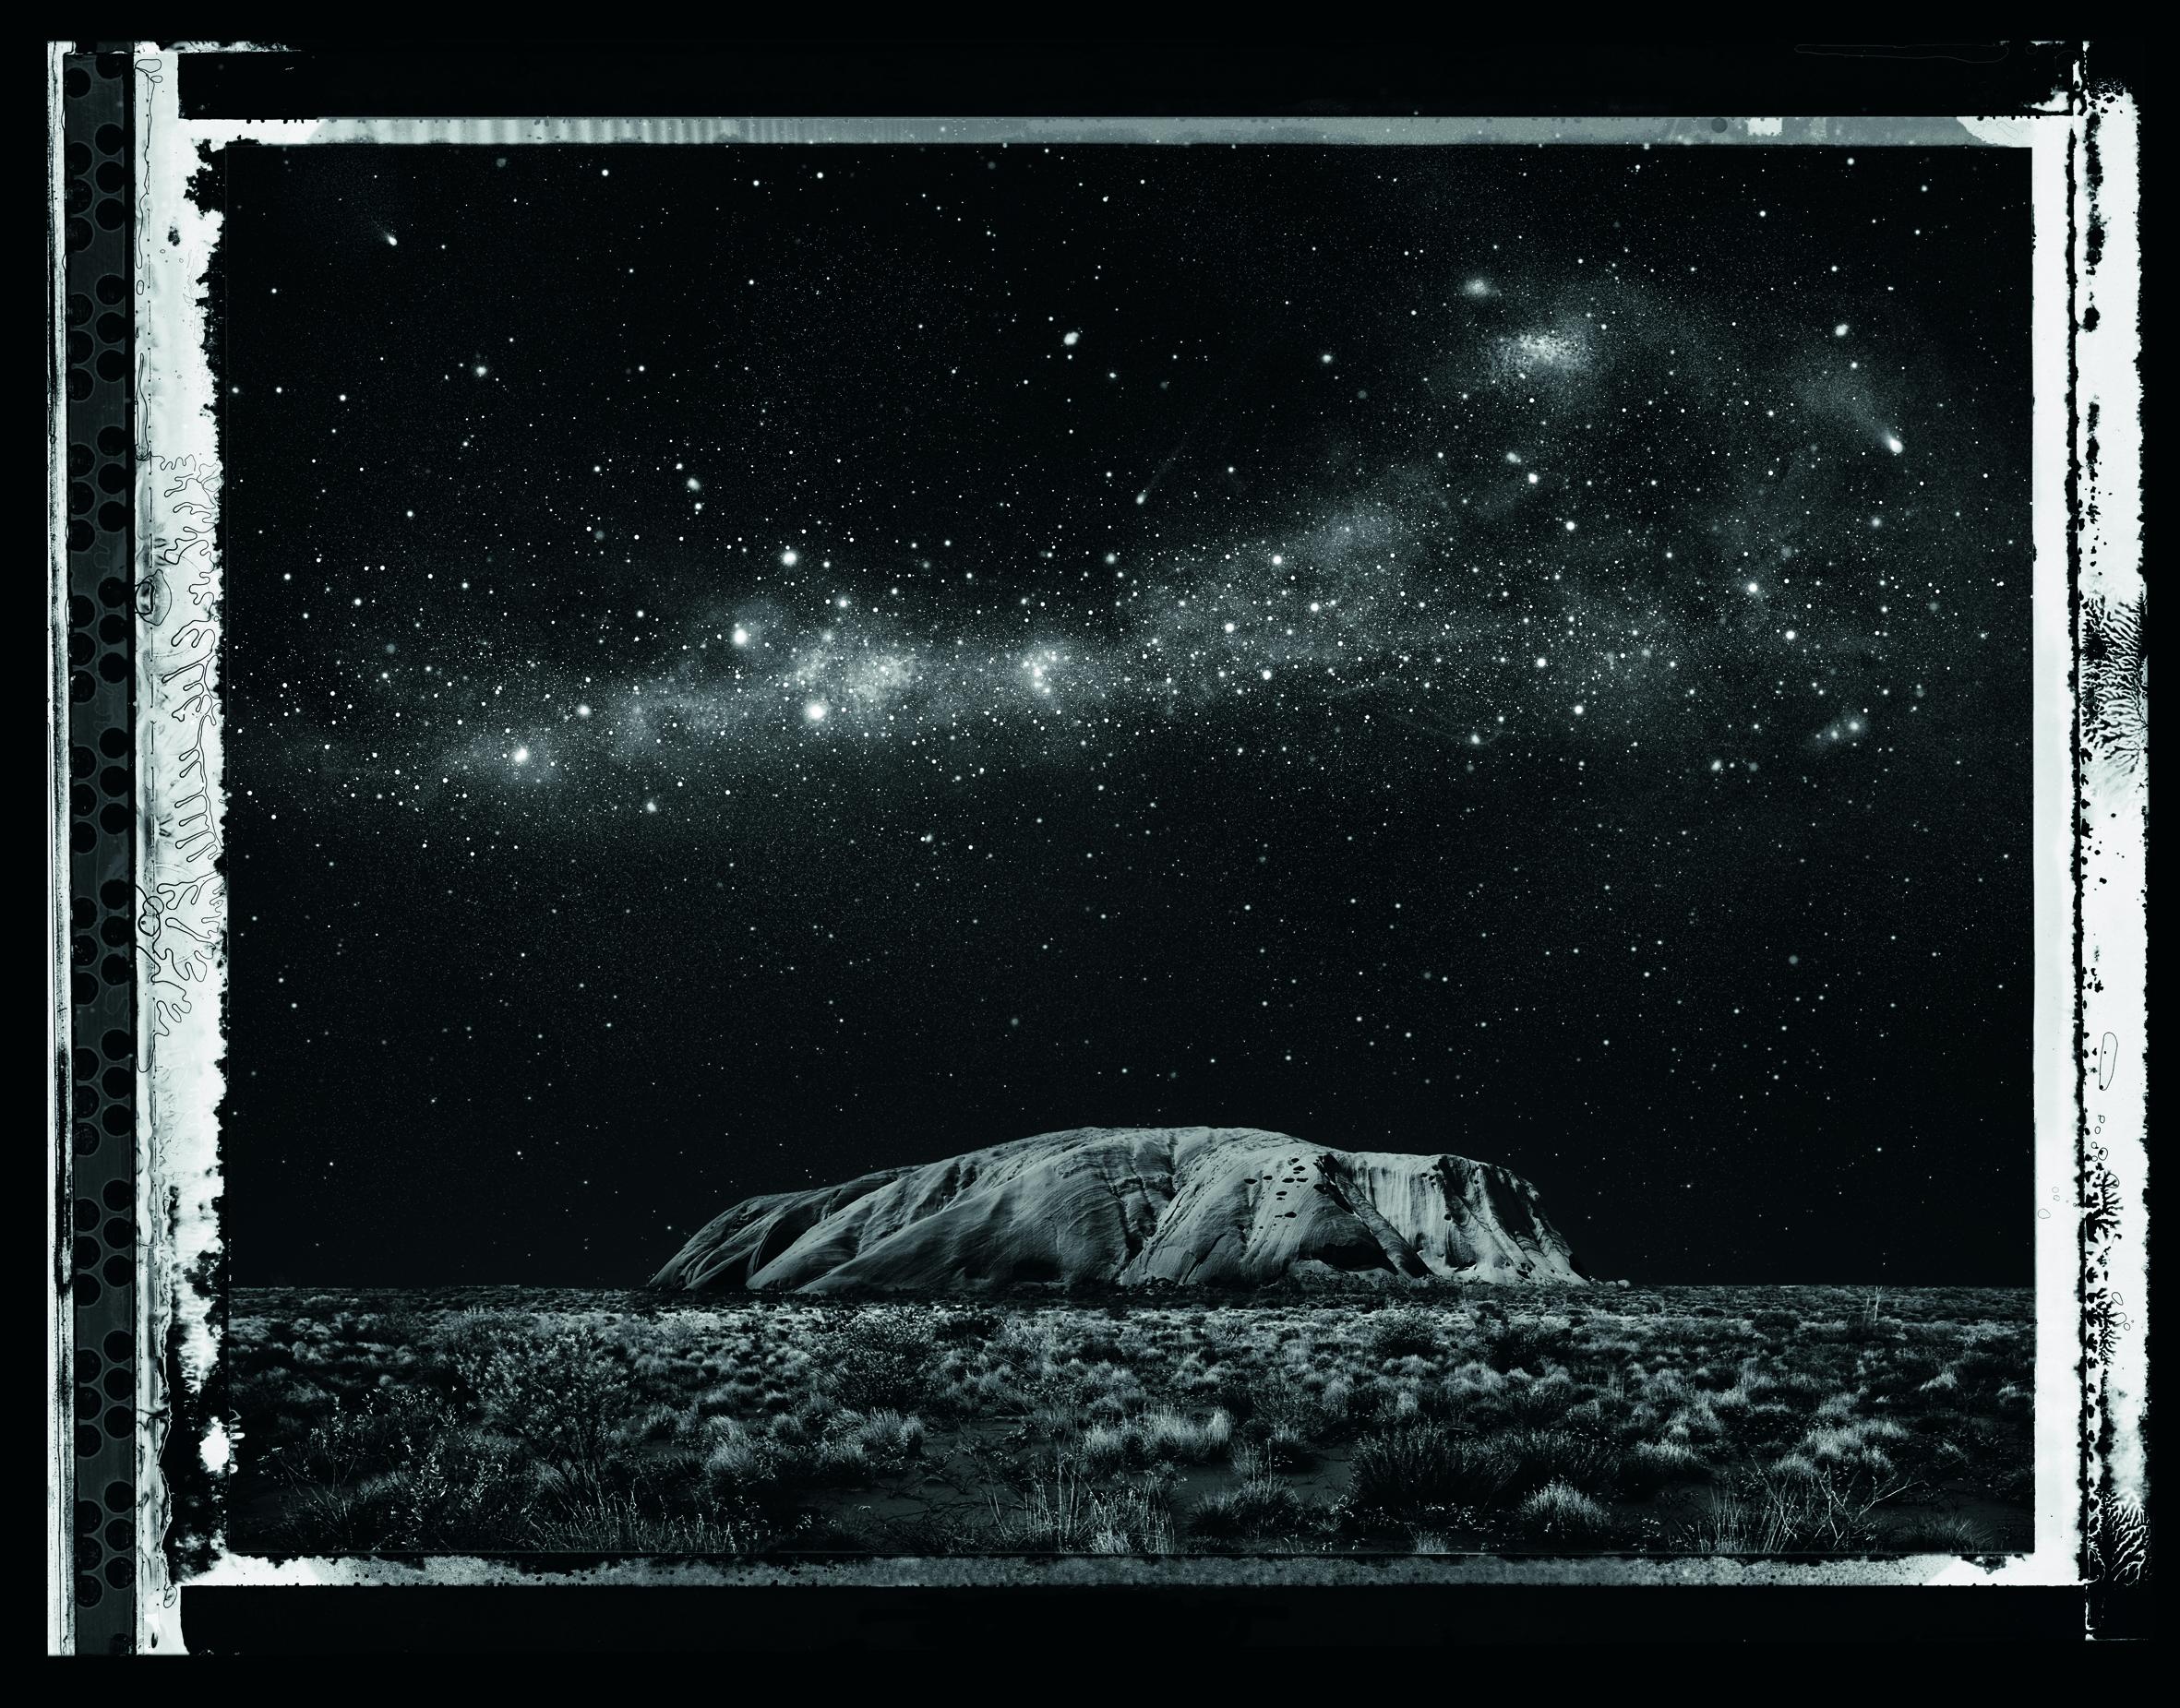 Uluru at night, artistic rendition